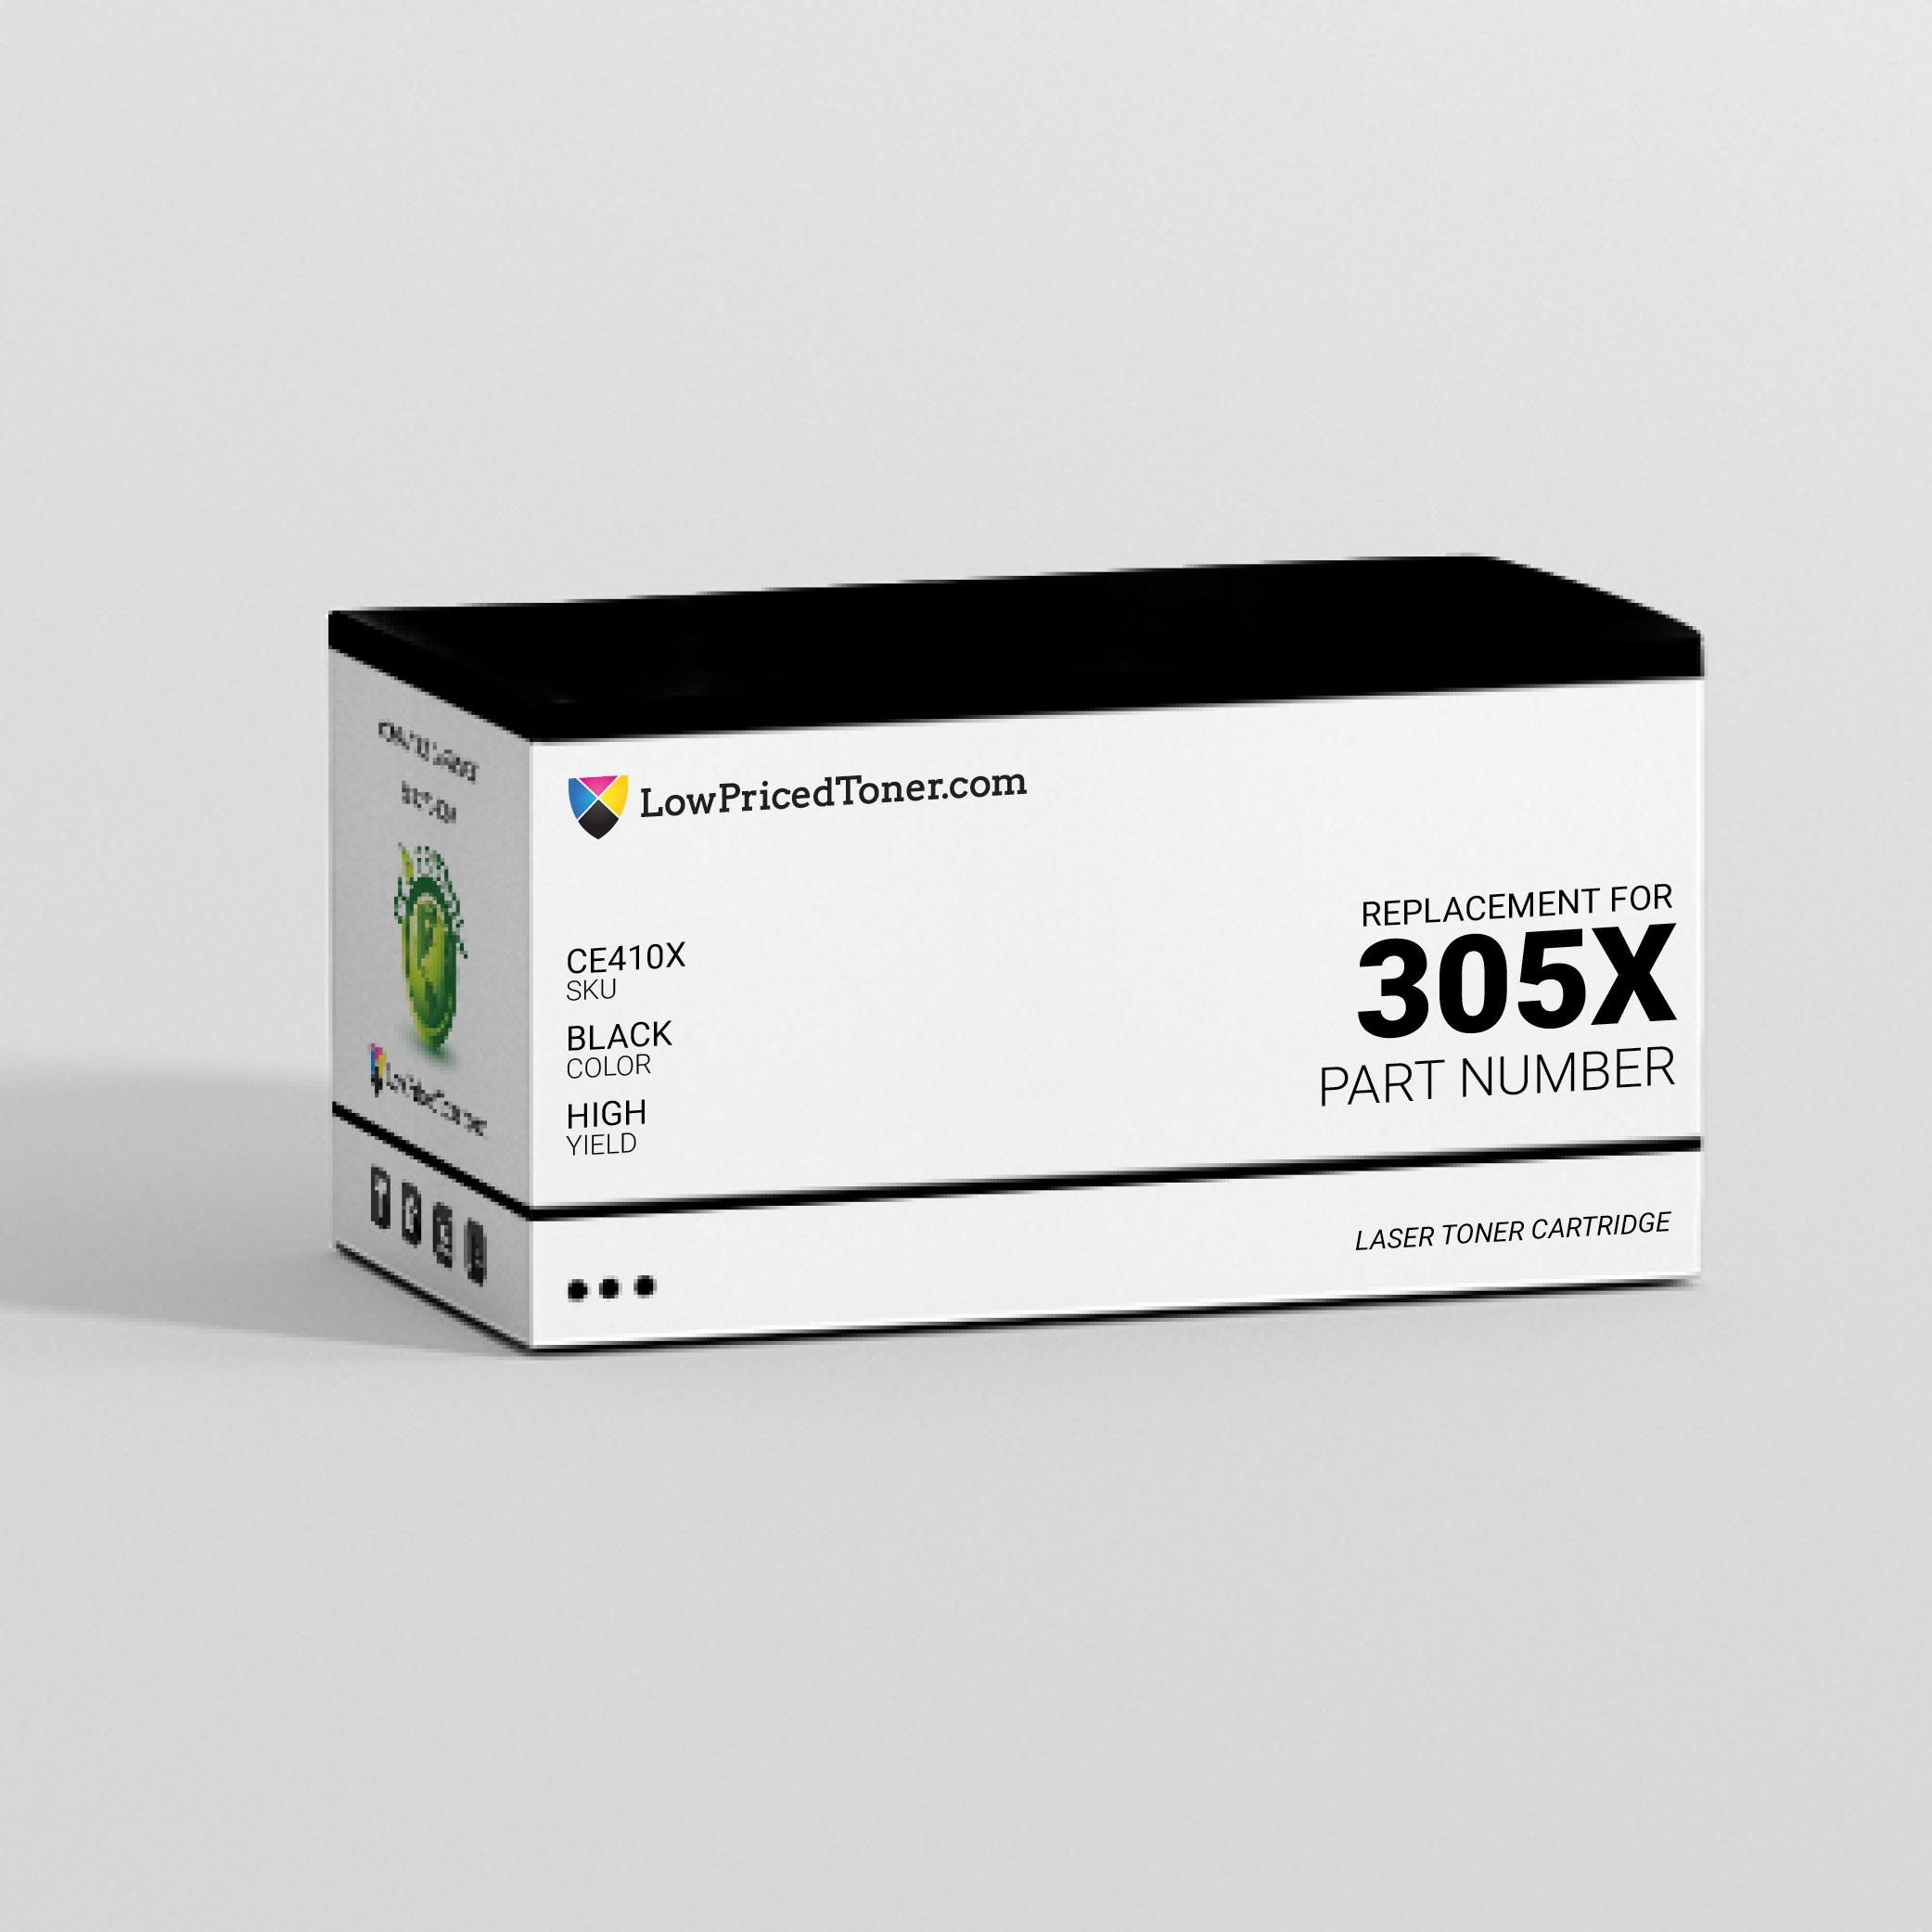 HP CE410X 305X Compatible Black Laser Toner Cartridge High Yield